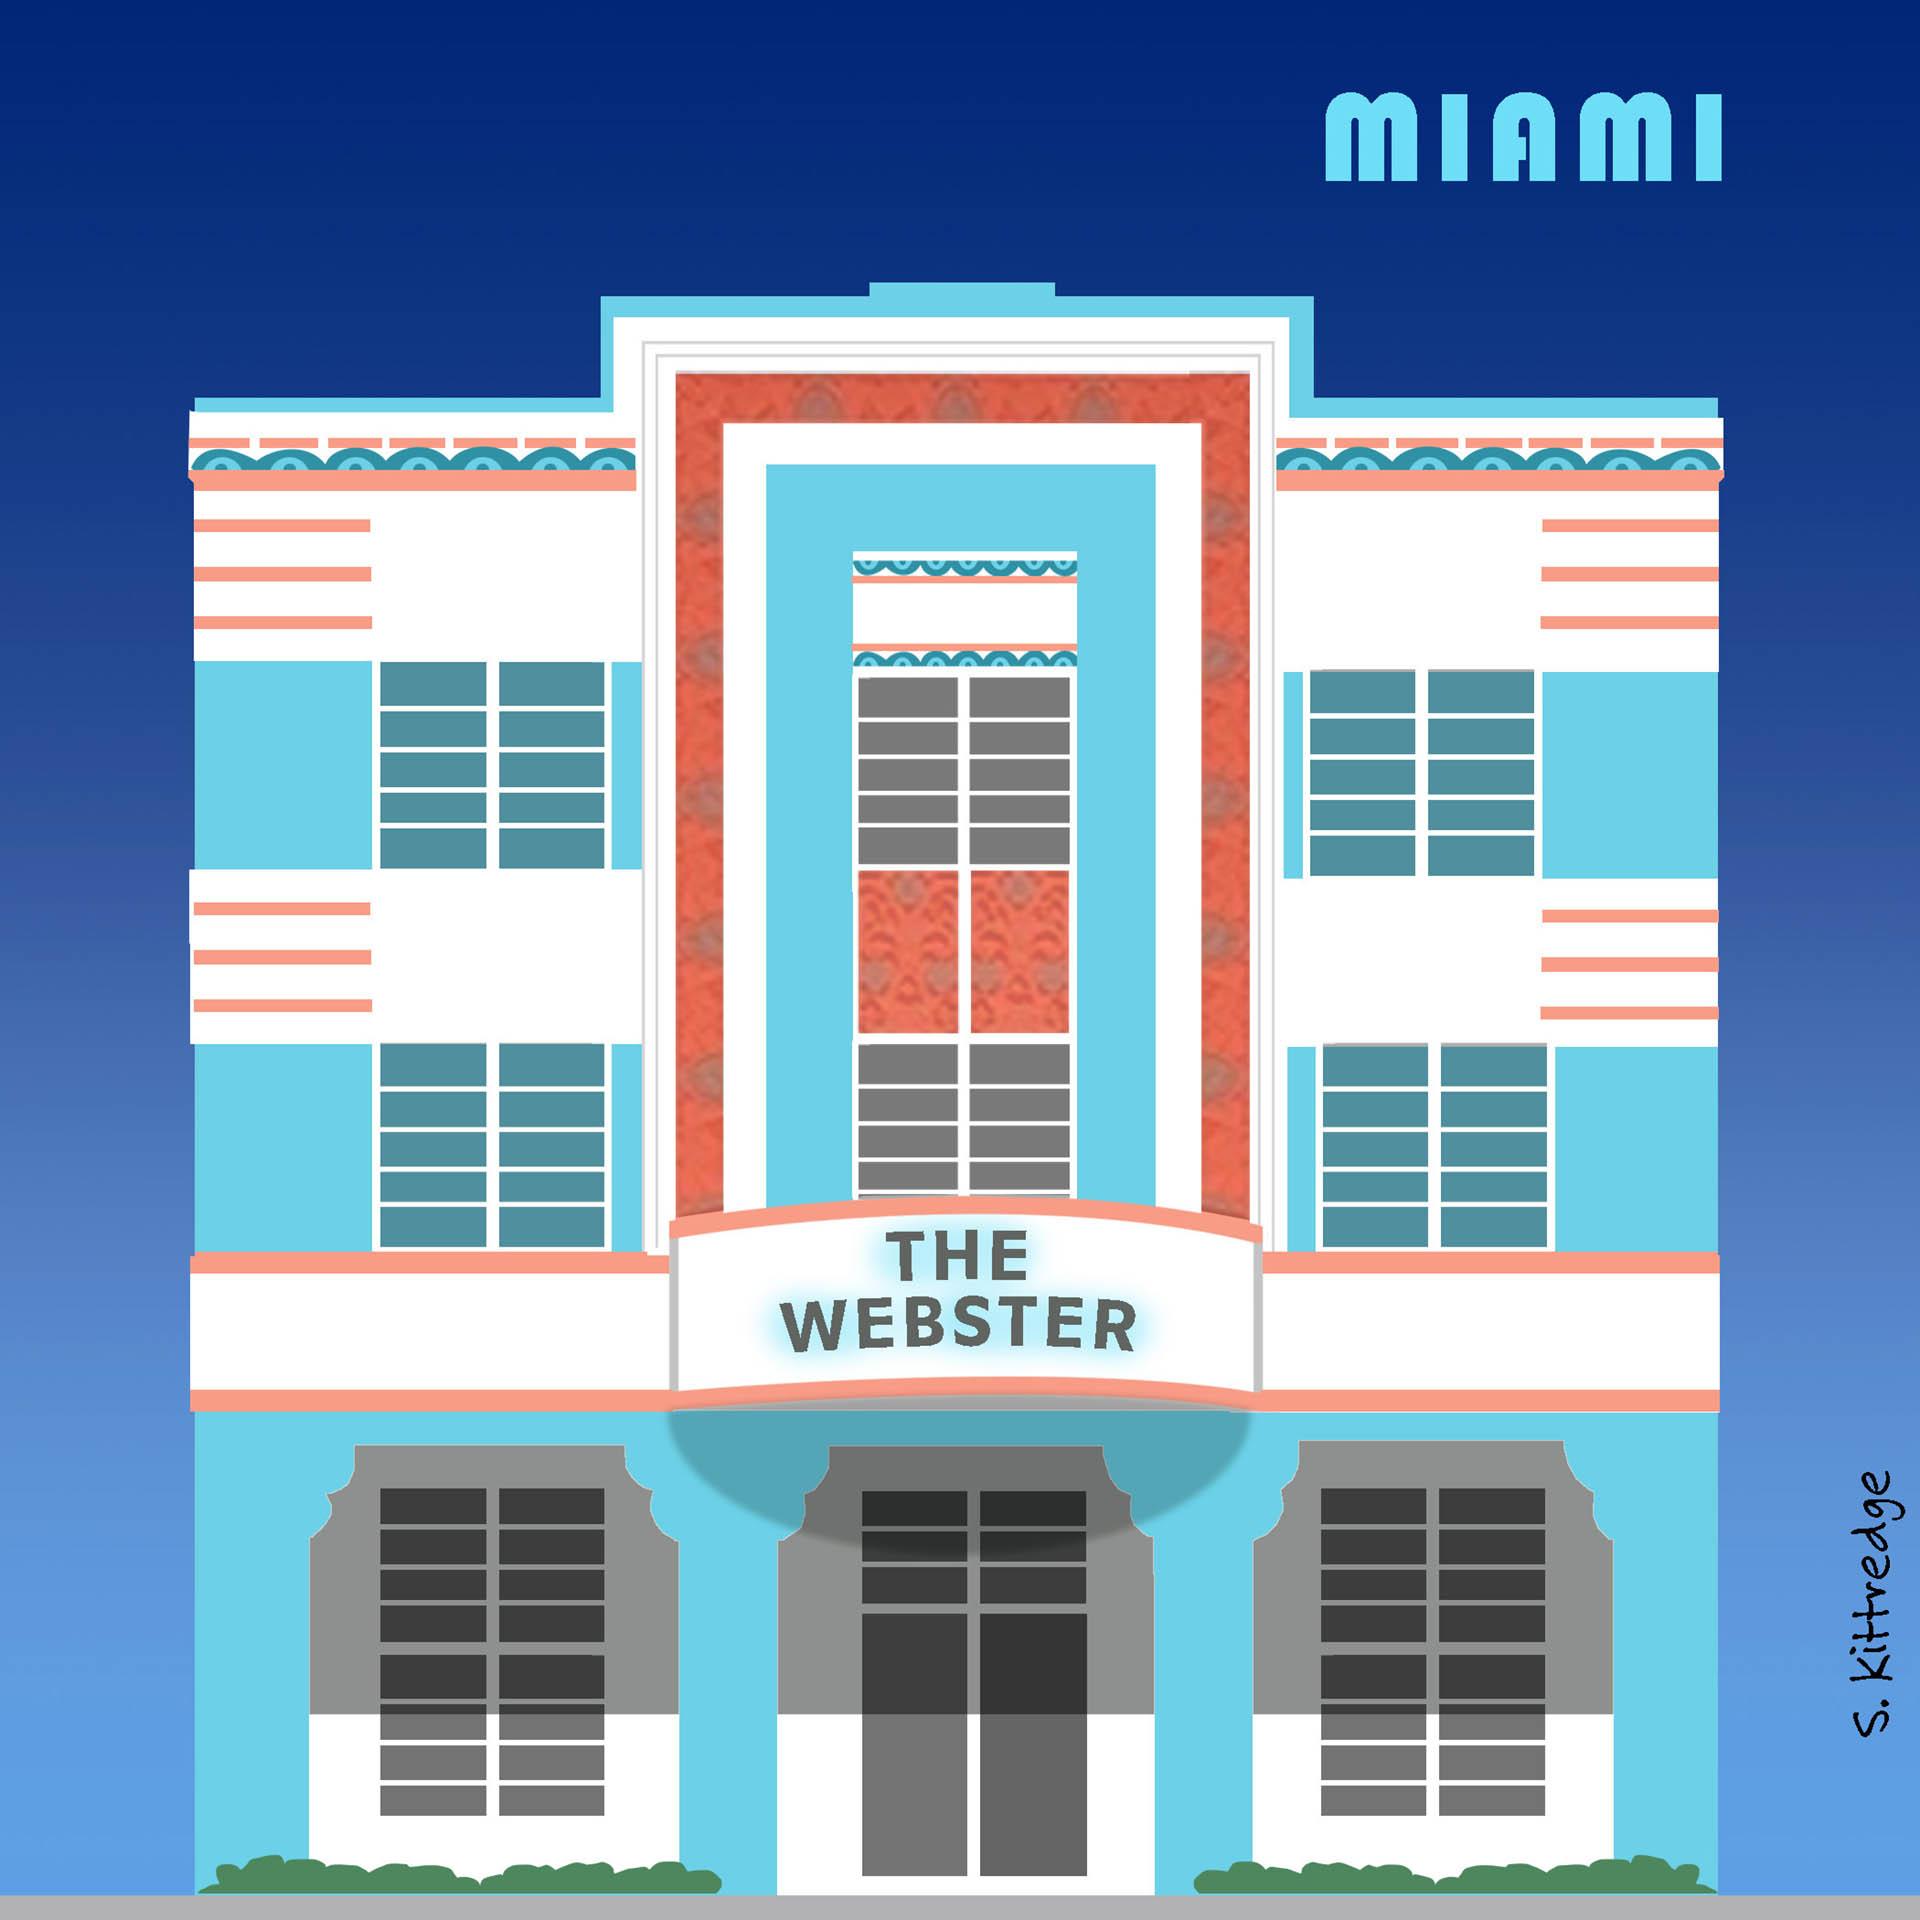 Miami Inktober Illustration 2020 • Project: They Draw & Travel